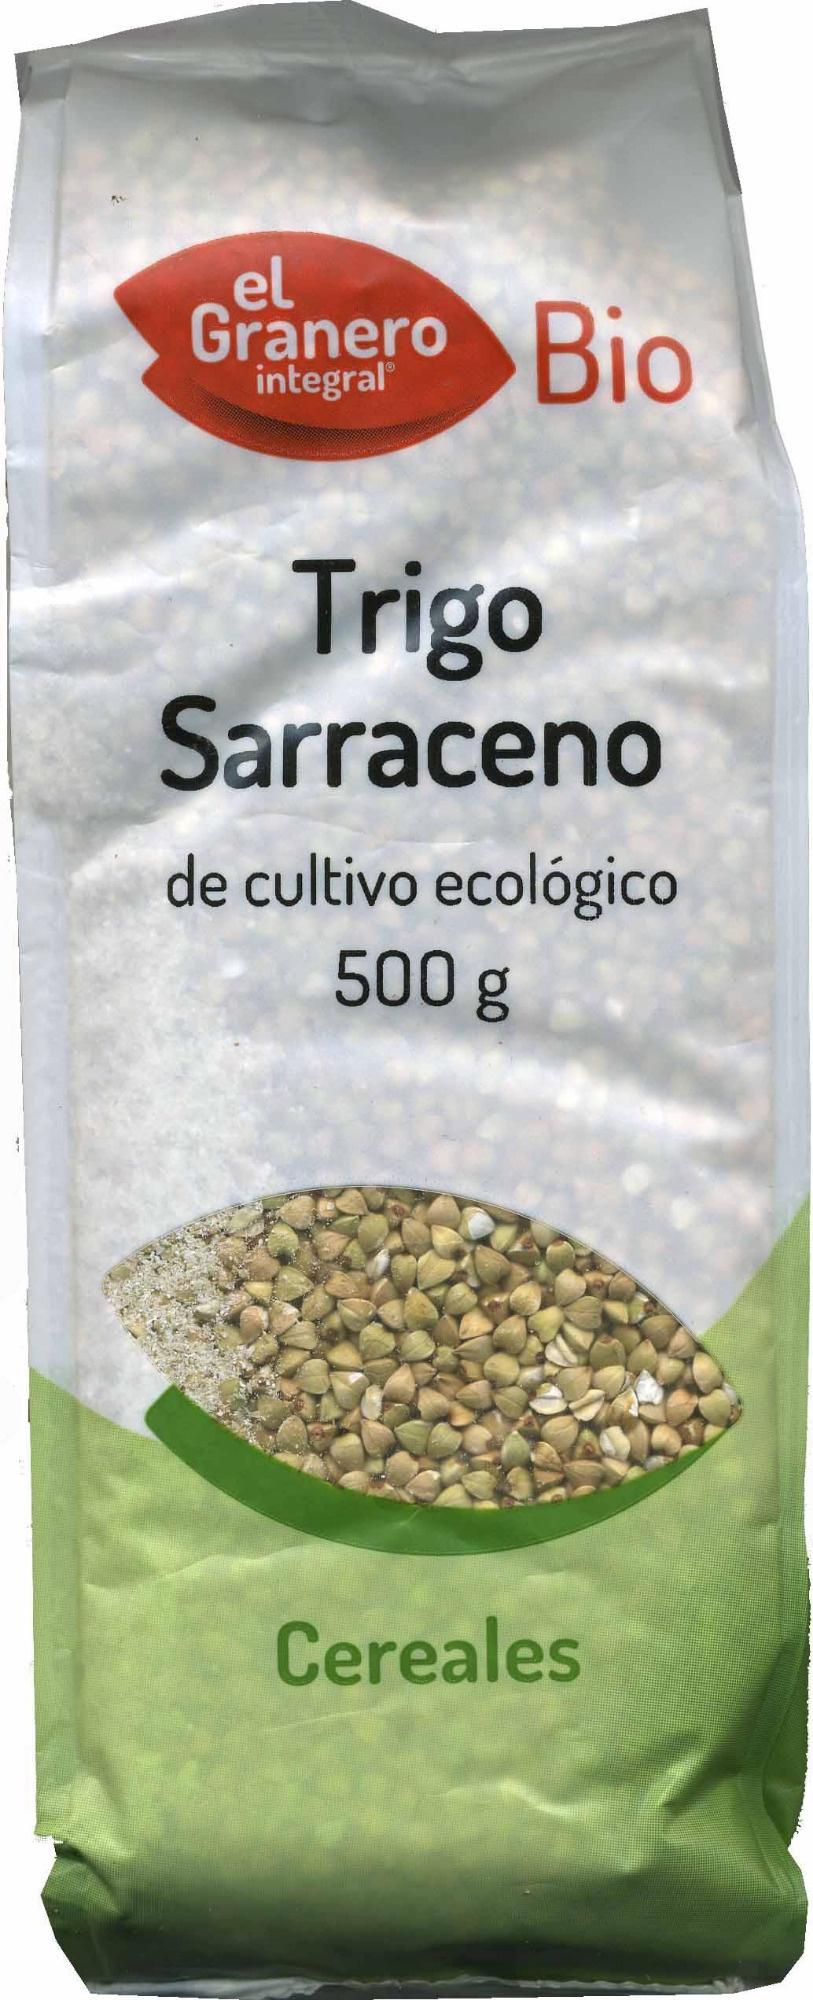 Trigo sarraceno - Producte - es